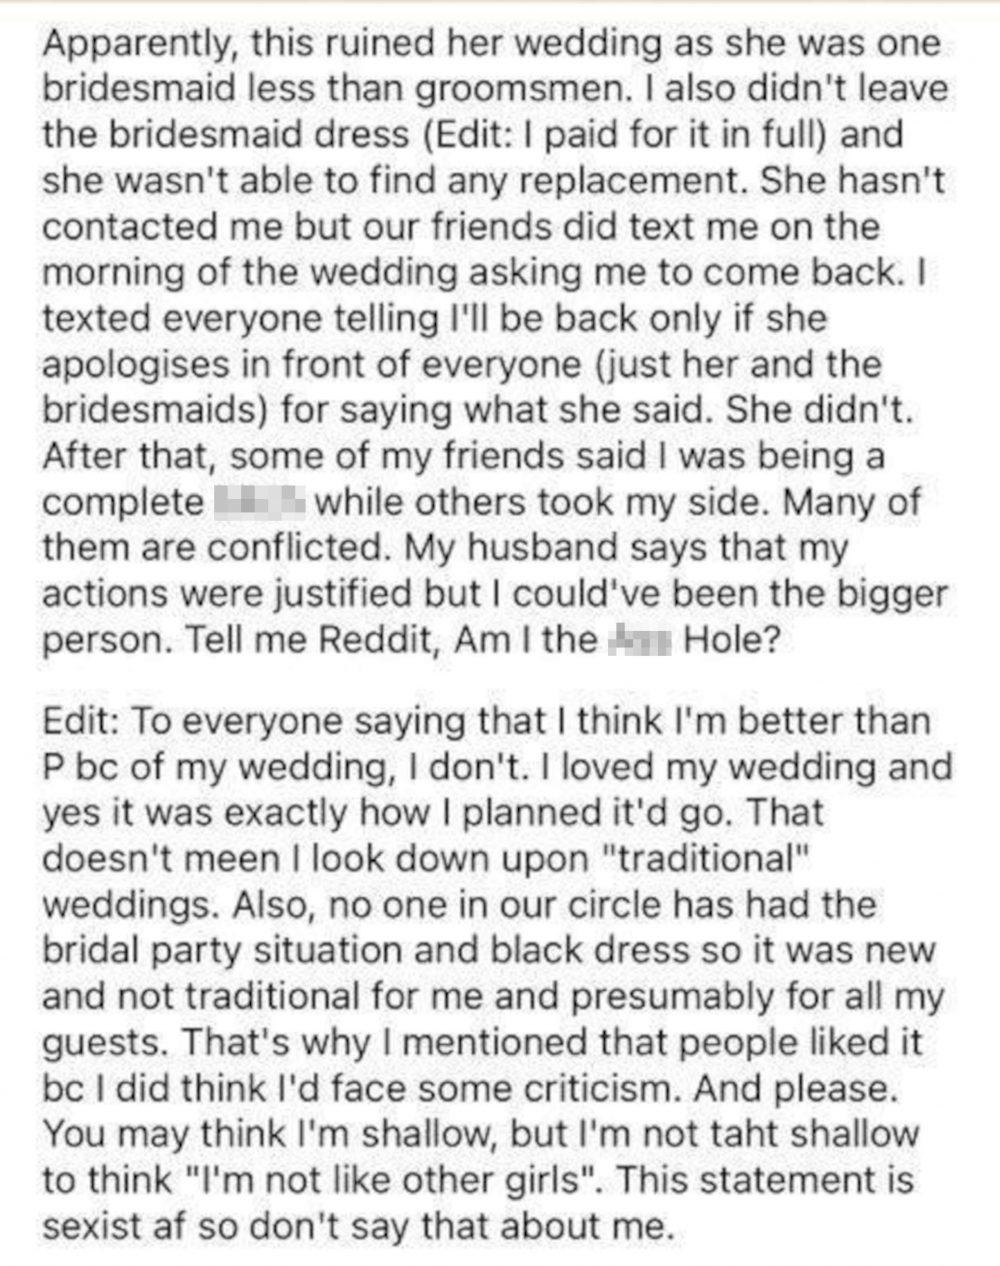 Quitting bridesmaid fallout - wedding news